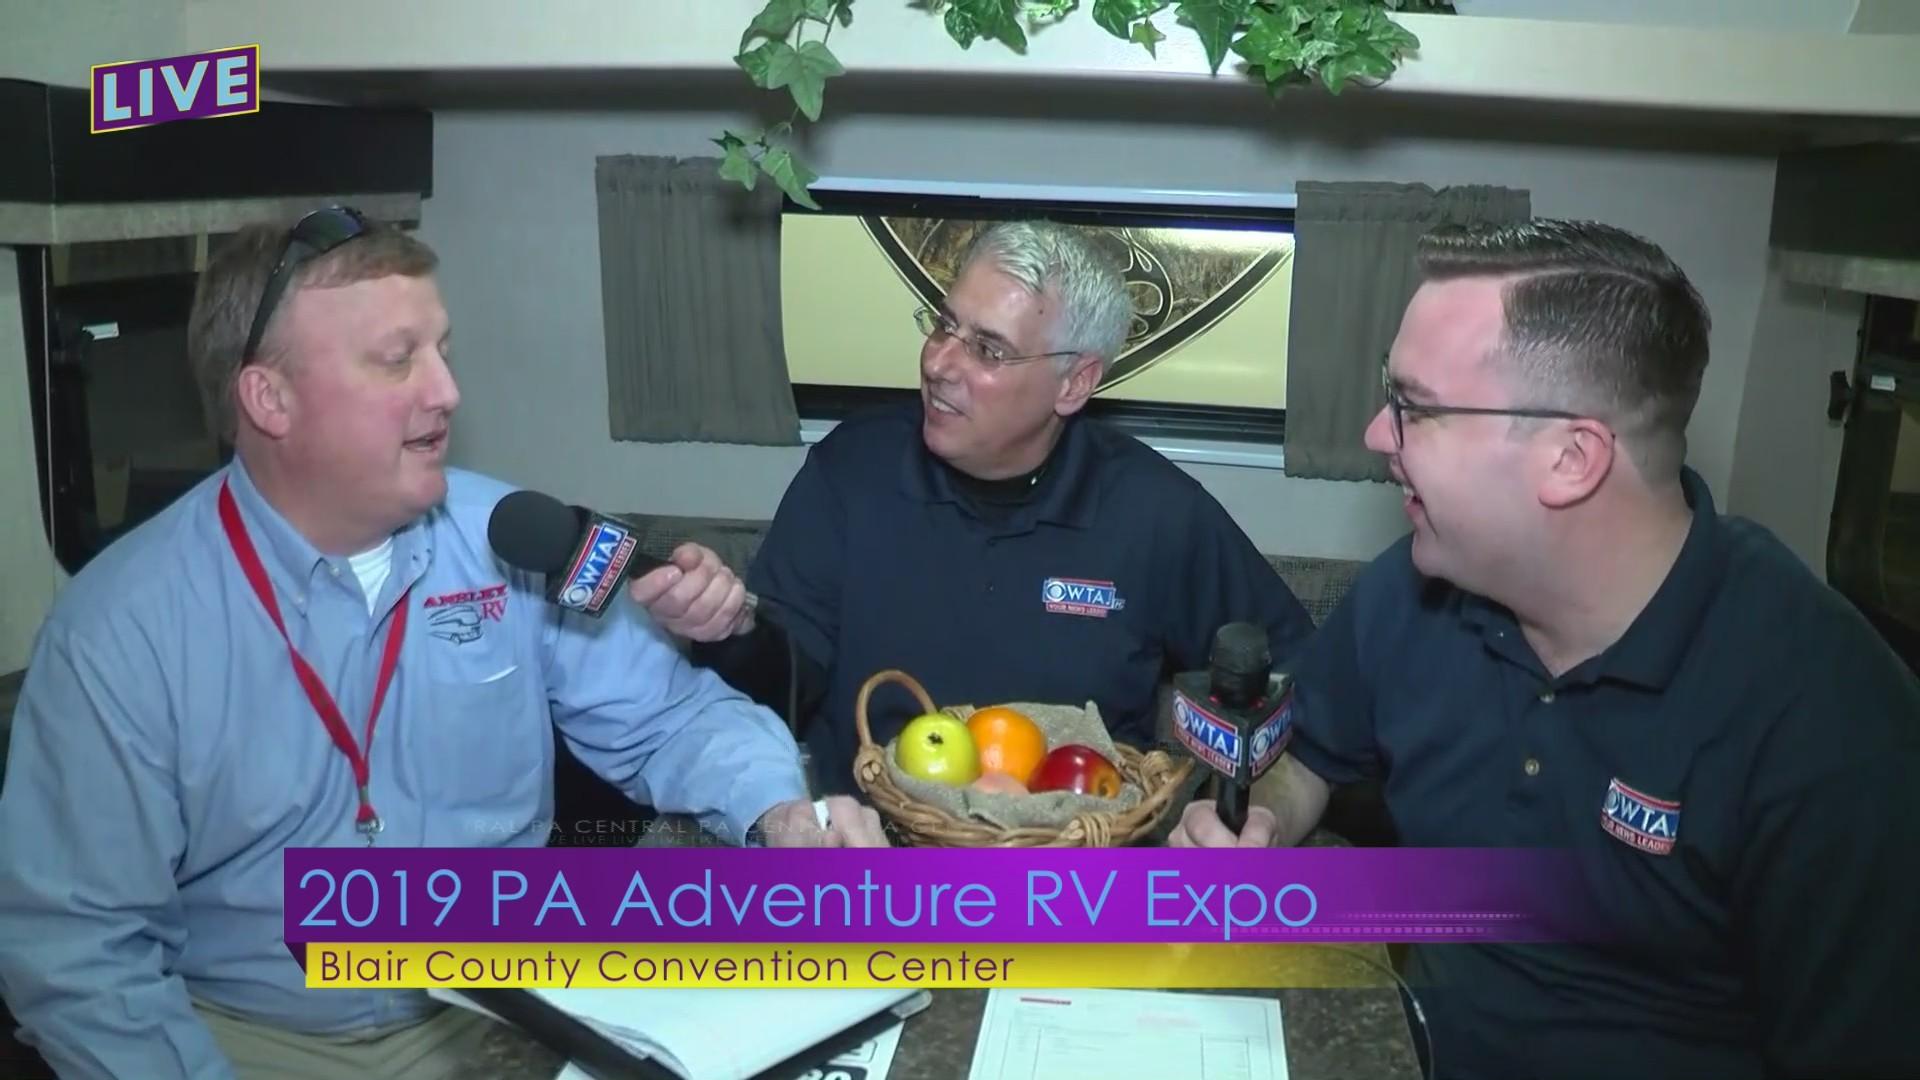 2-22 PA Adventure RV Expo: Ansley RV